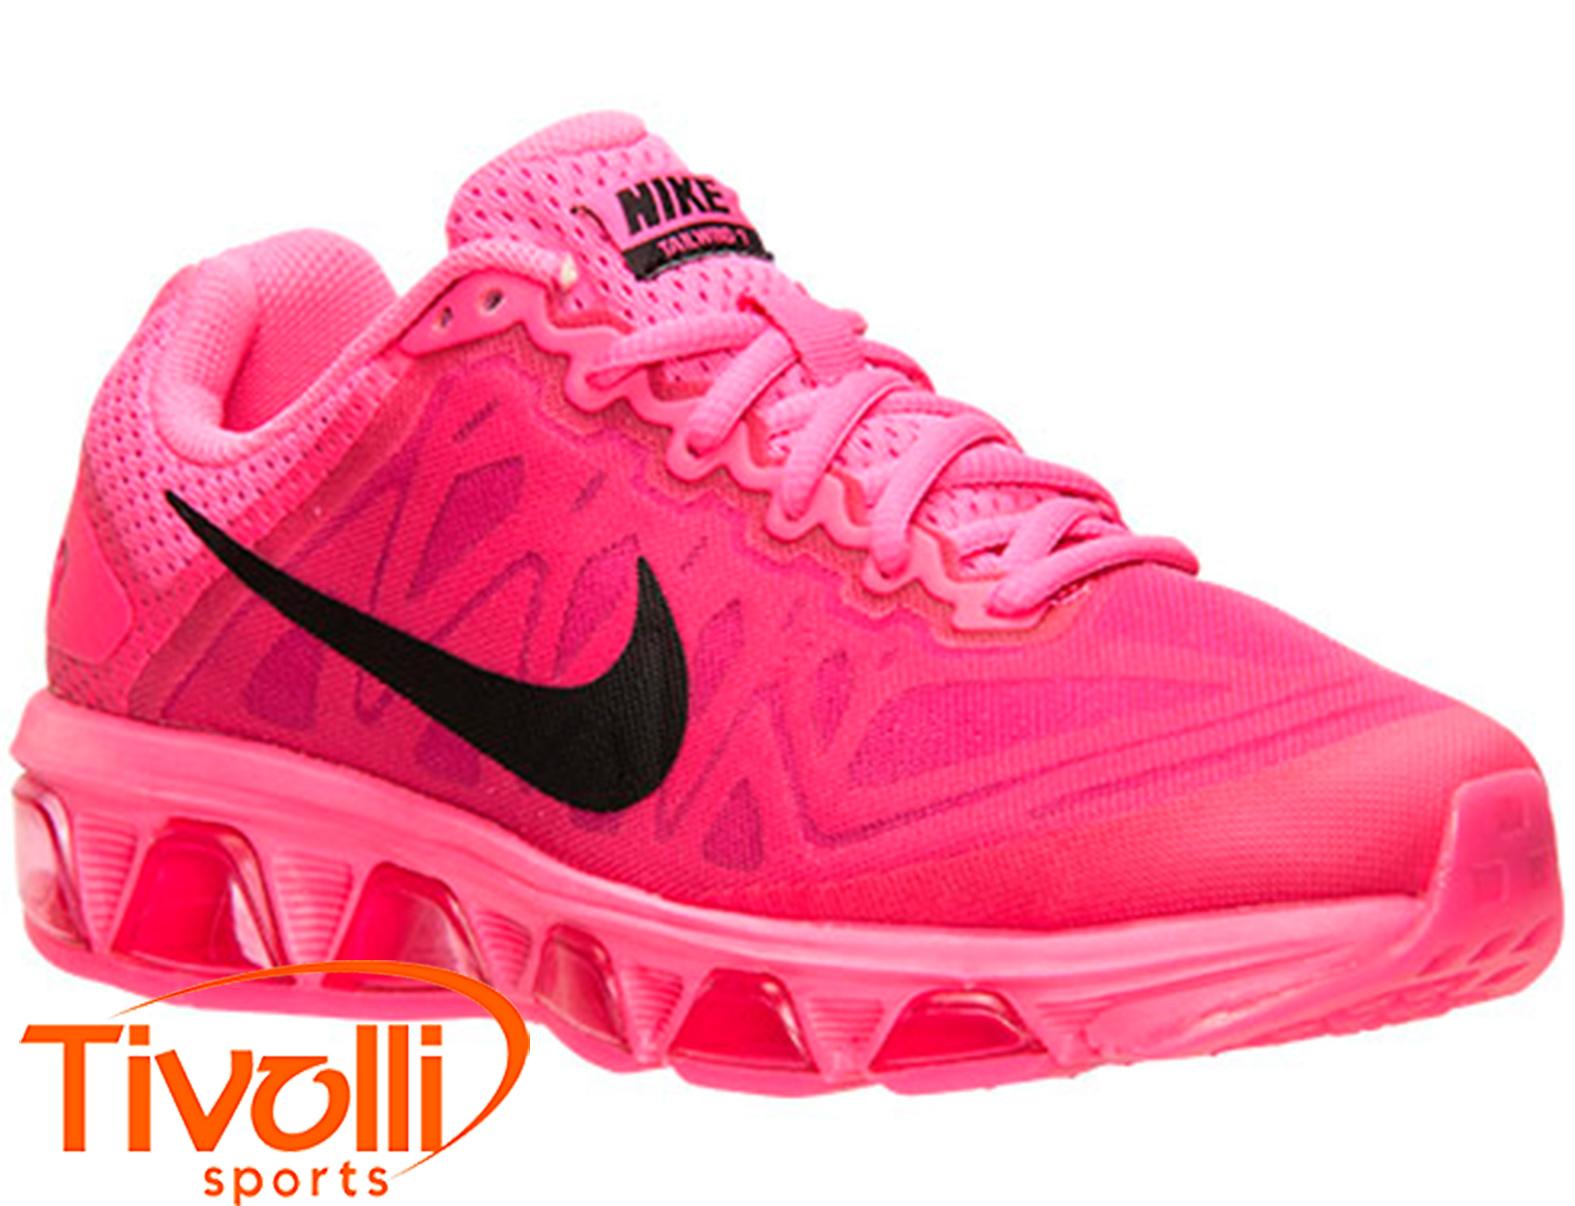 size 40 2feae d224e Tênis Nike Air Max Tailwind 7 - Mega Saldão